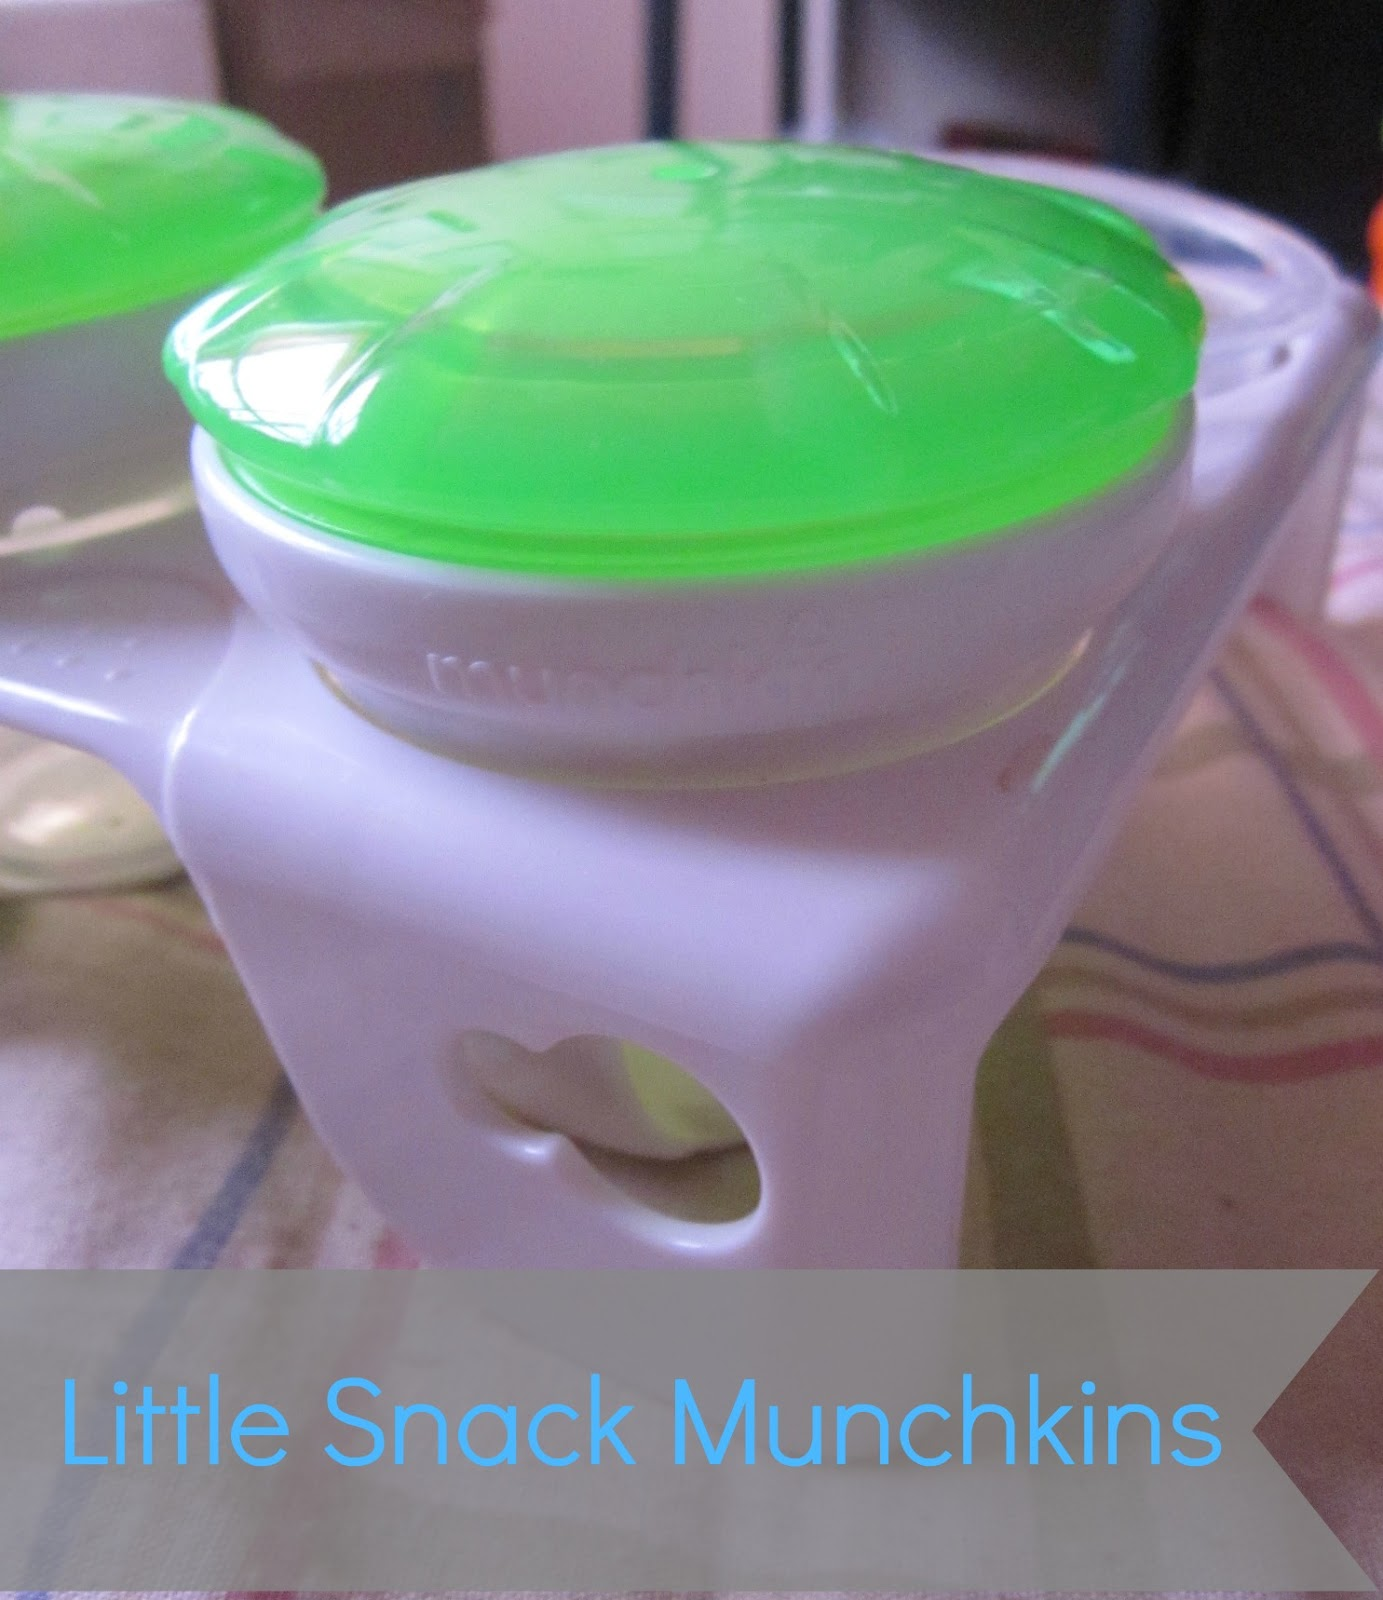 munchkin products